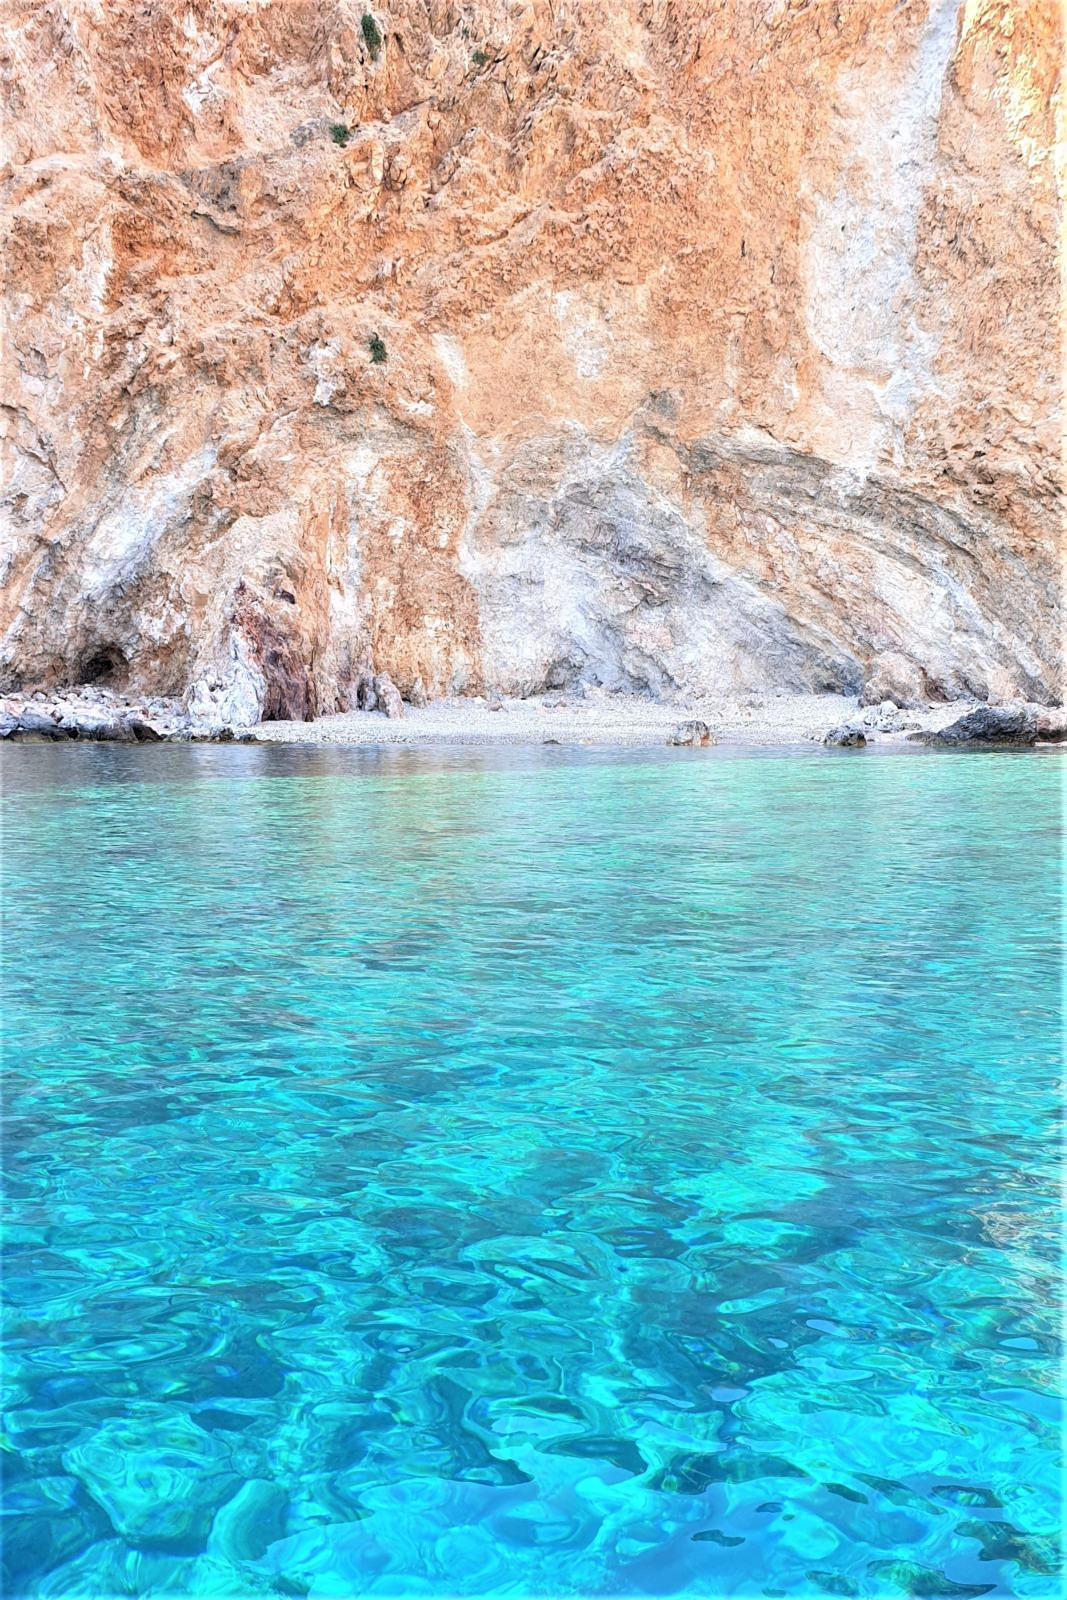 Polyaigos - Cicladi Occidentali - Grecia